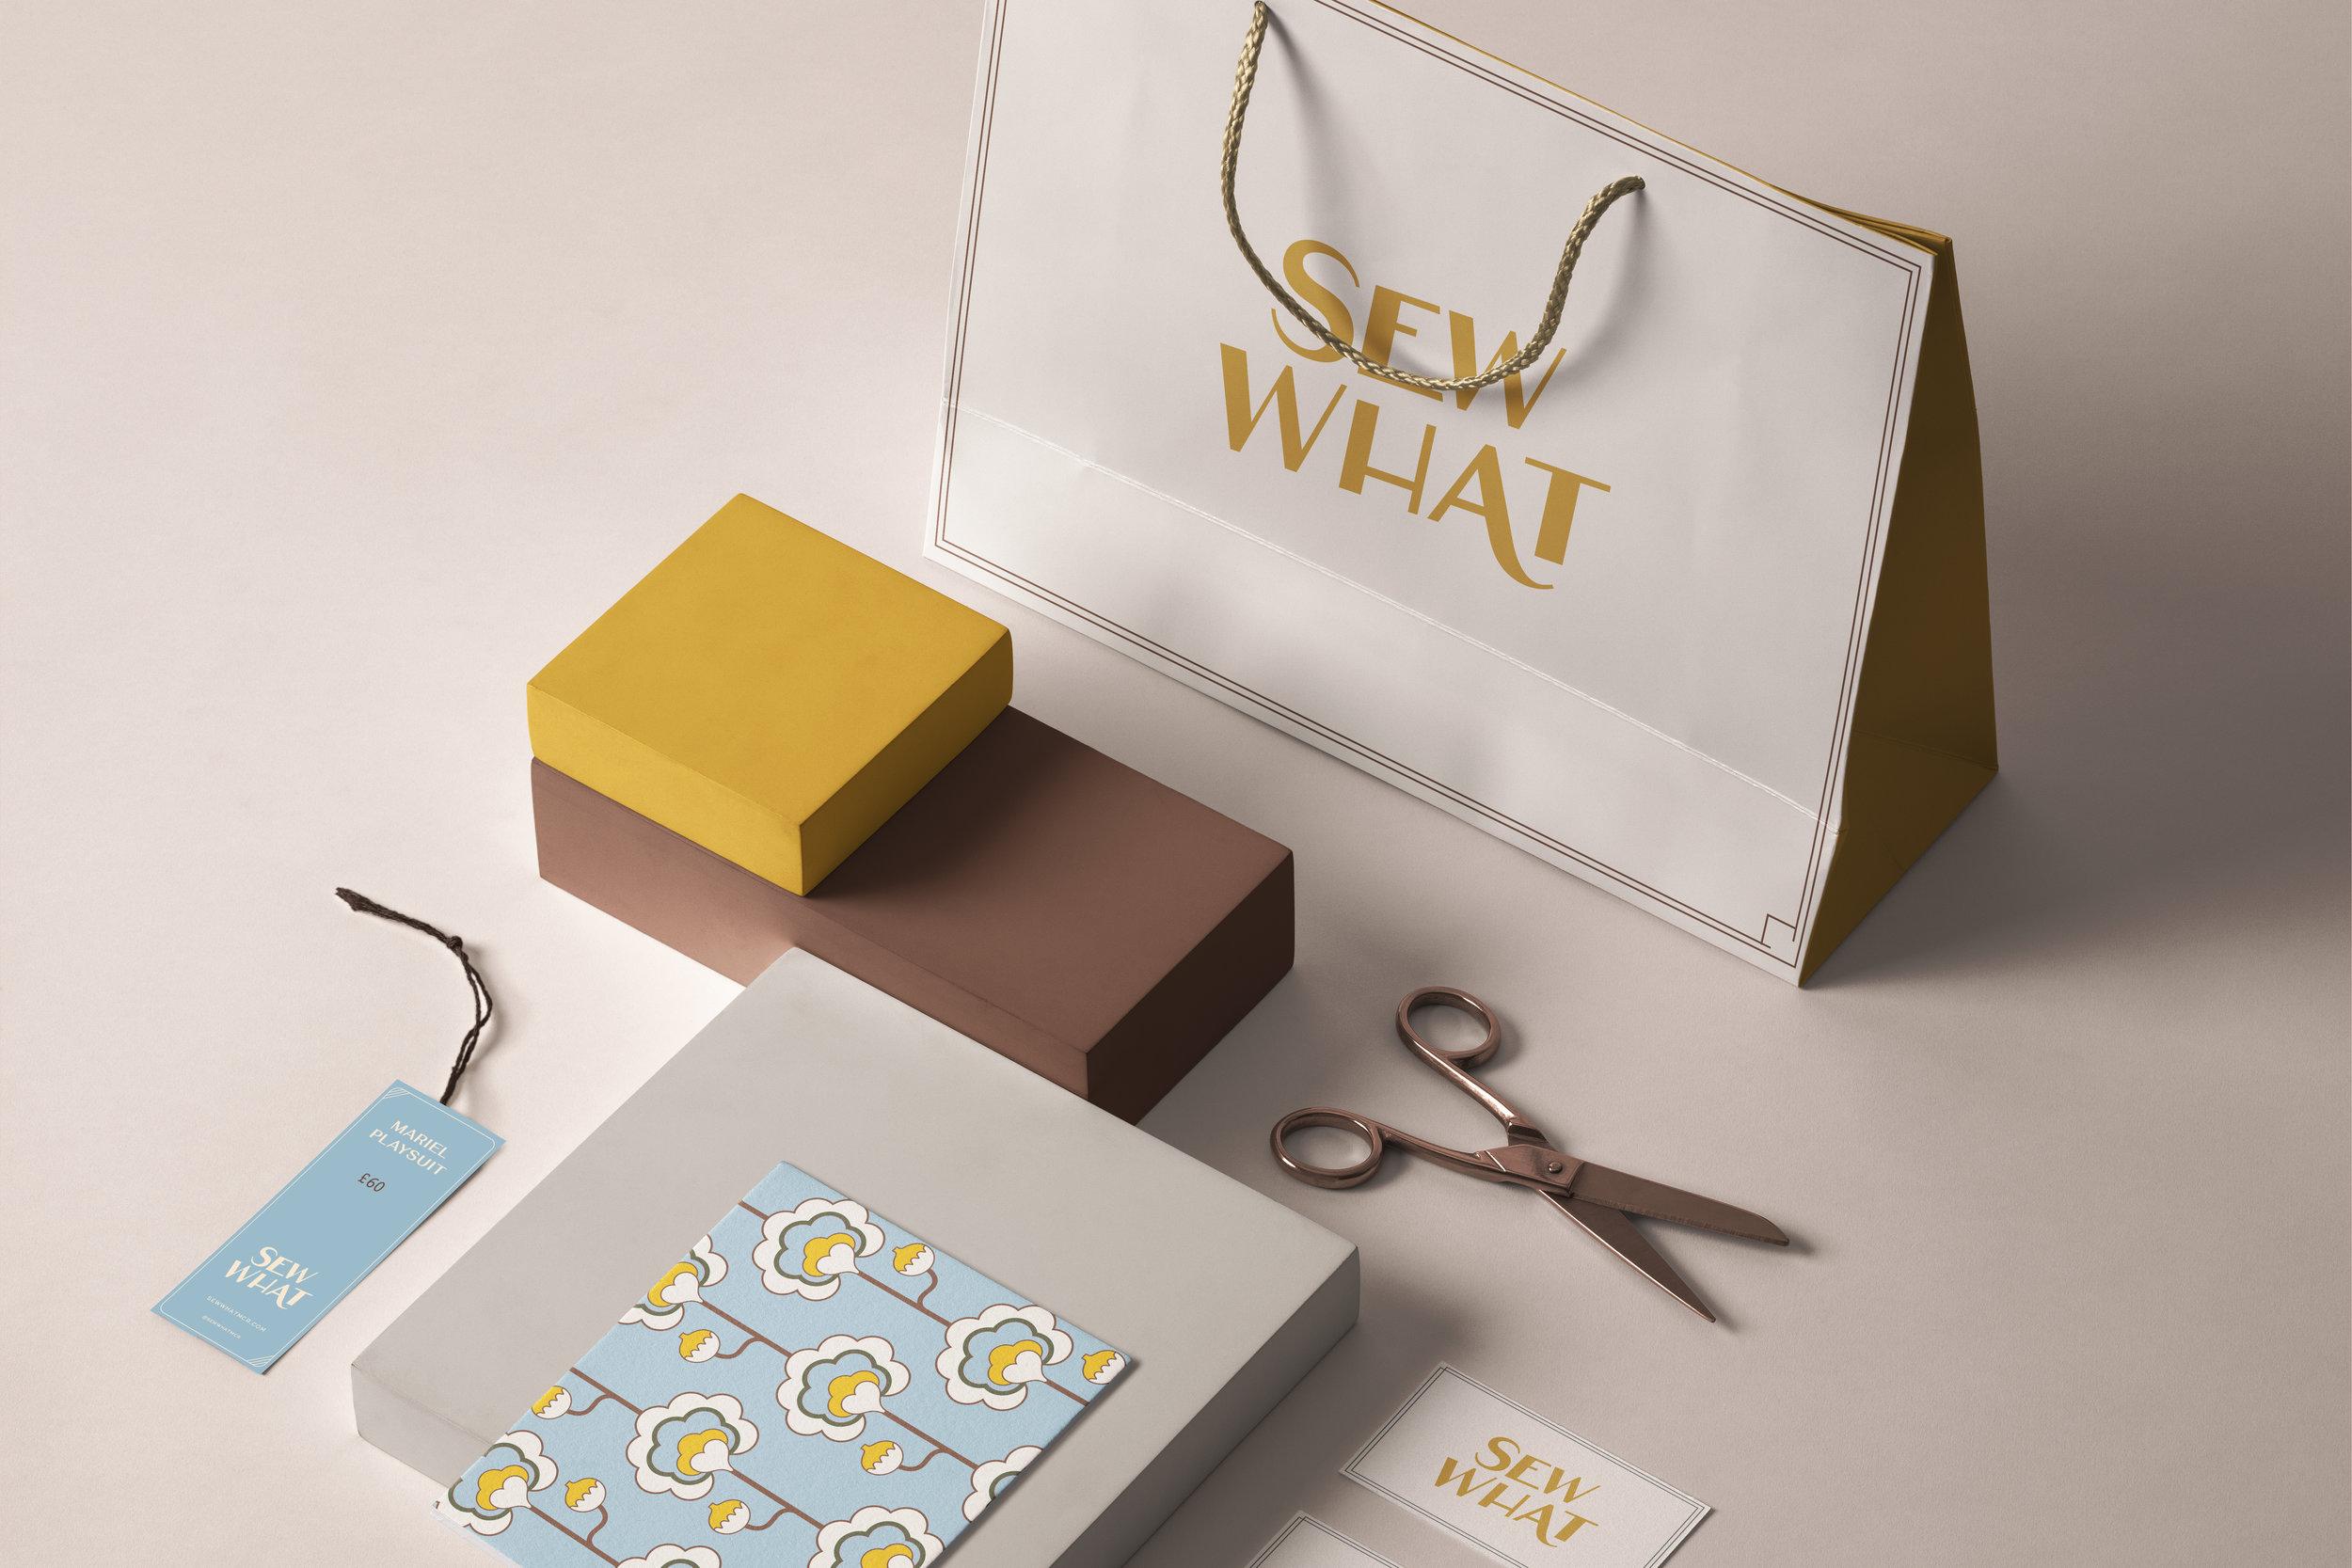 sewwhat_identity_design_stationery-bag.jpg